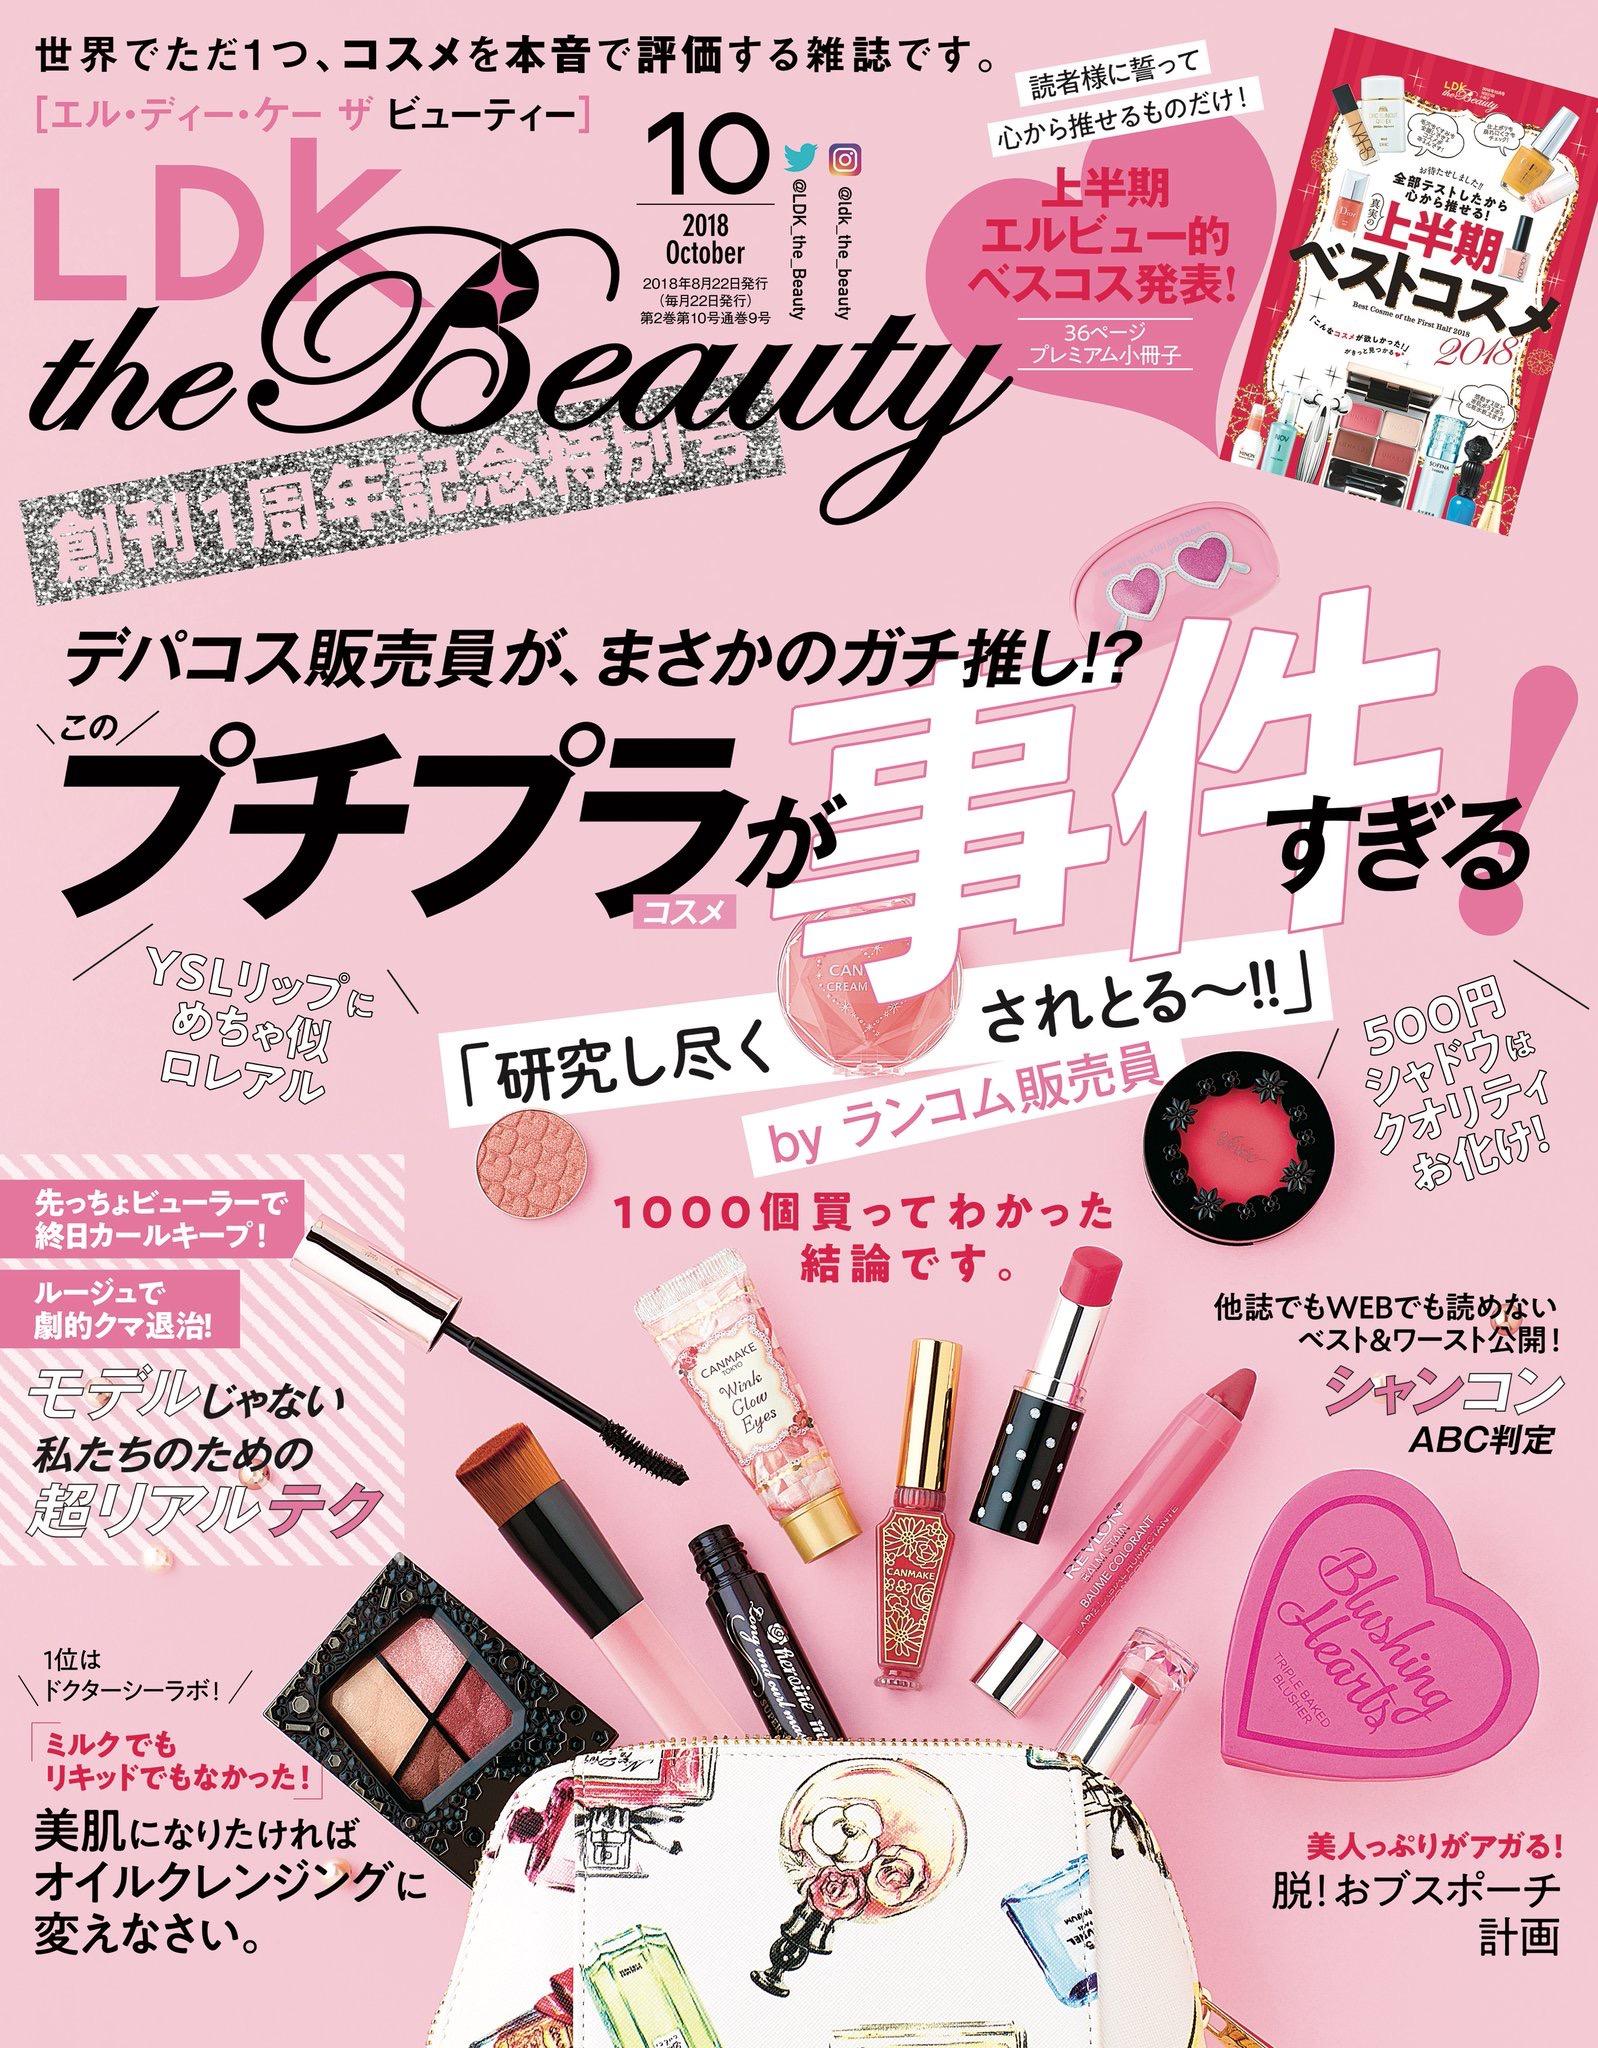 「LDK the Beauty 2018年10月号」で紹介されました!